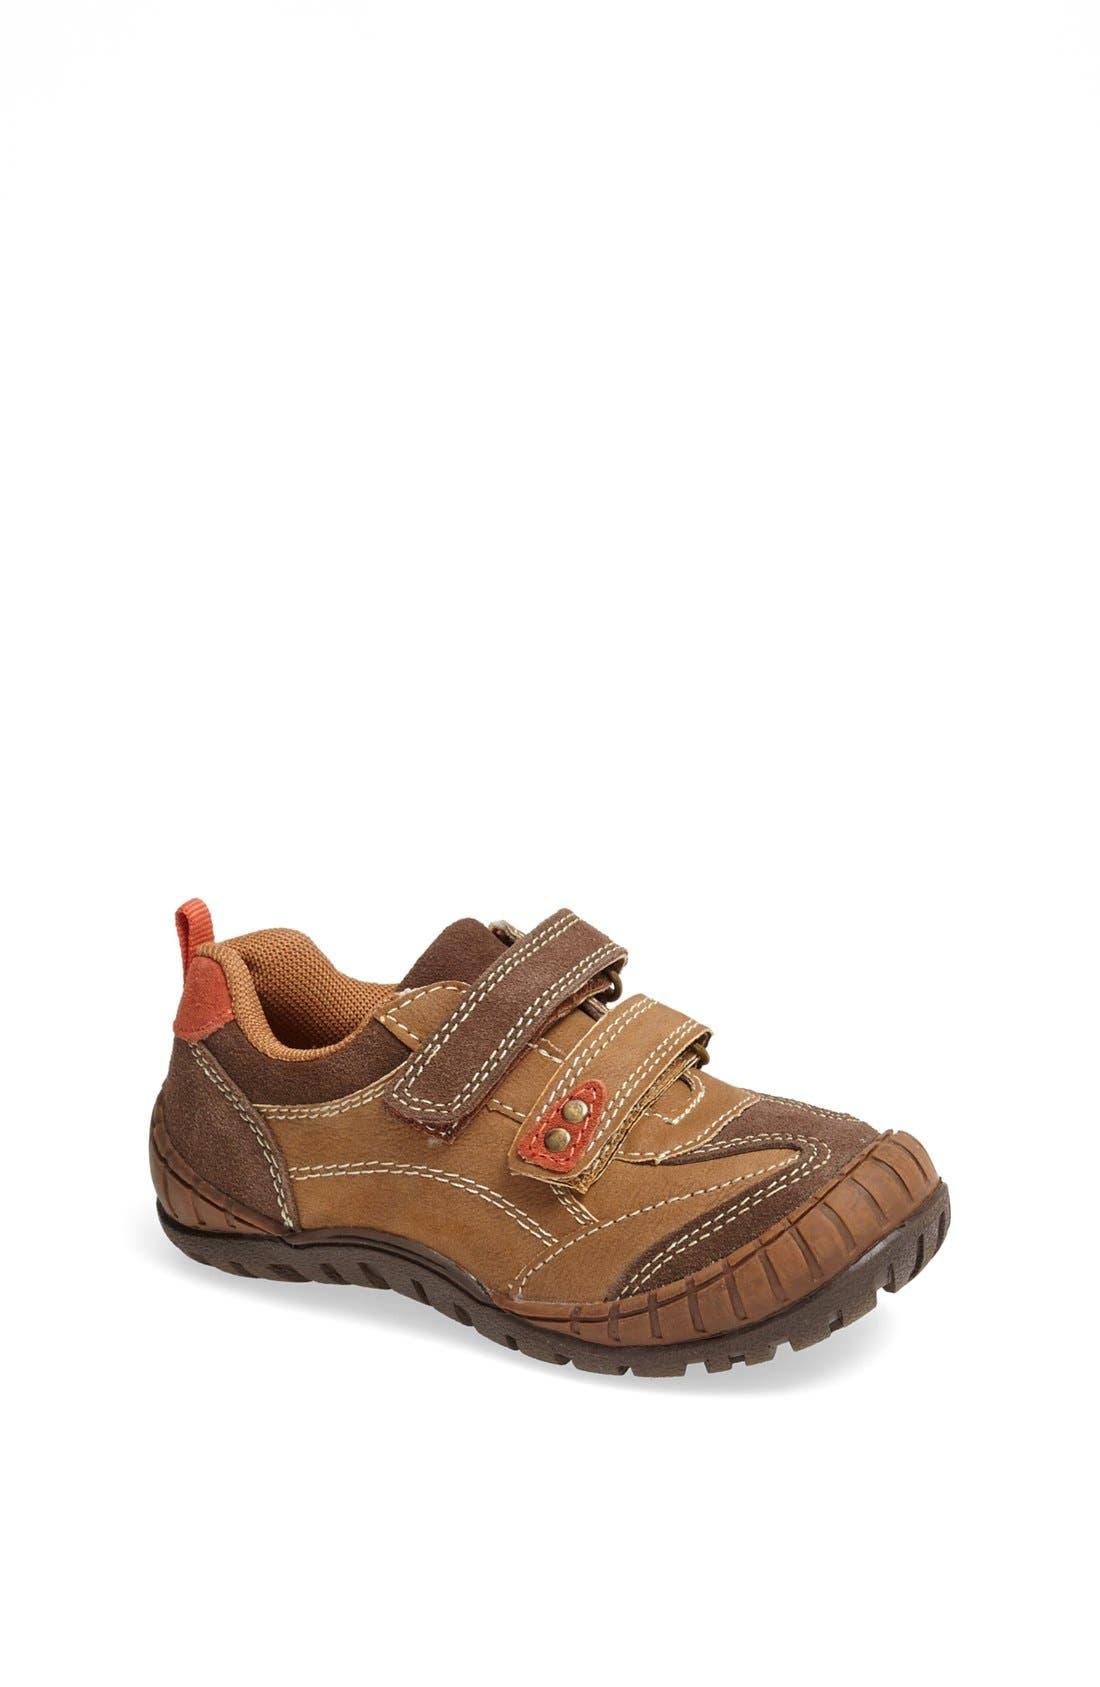 Main Image - Jumping Jacks 'Mack' Sneaker (Toddler & Little Kid)